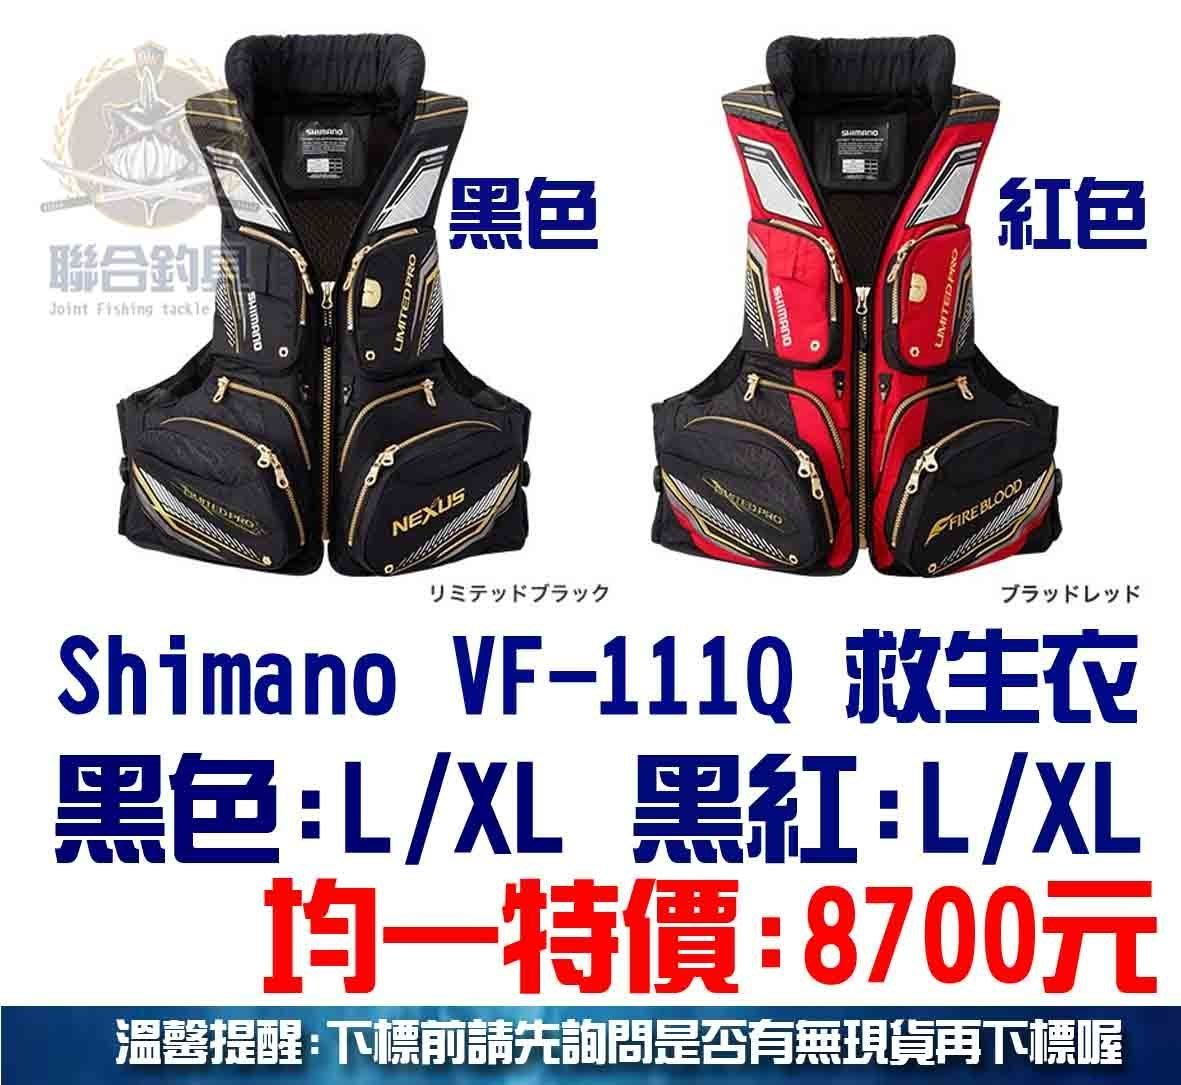 苗栗-竹南 【聯合釣具】Shimano VF-111Q 救生衣